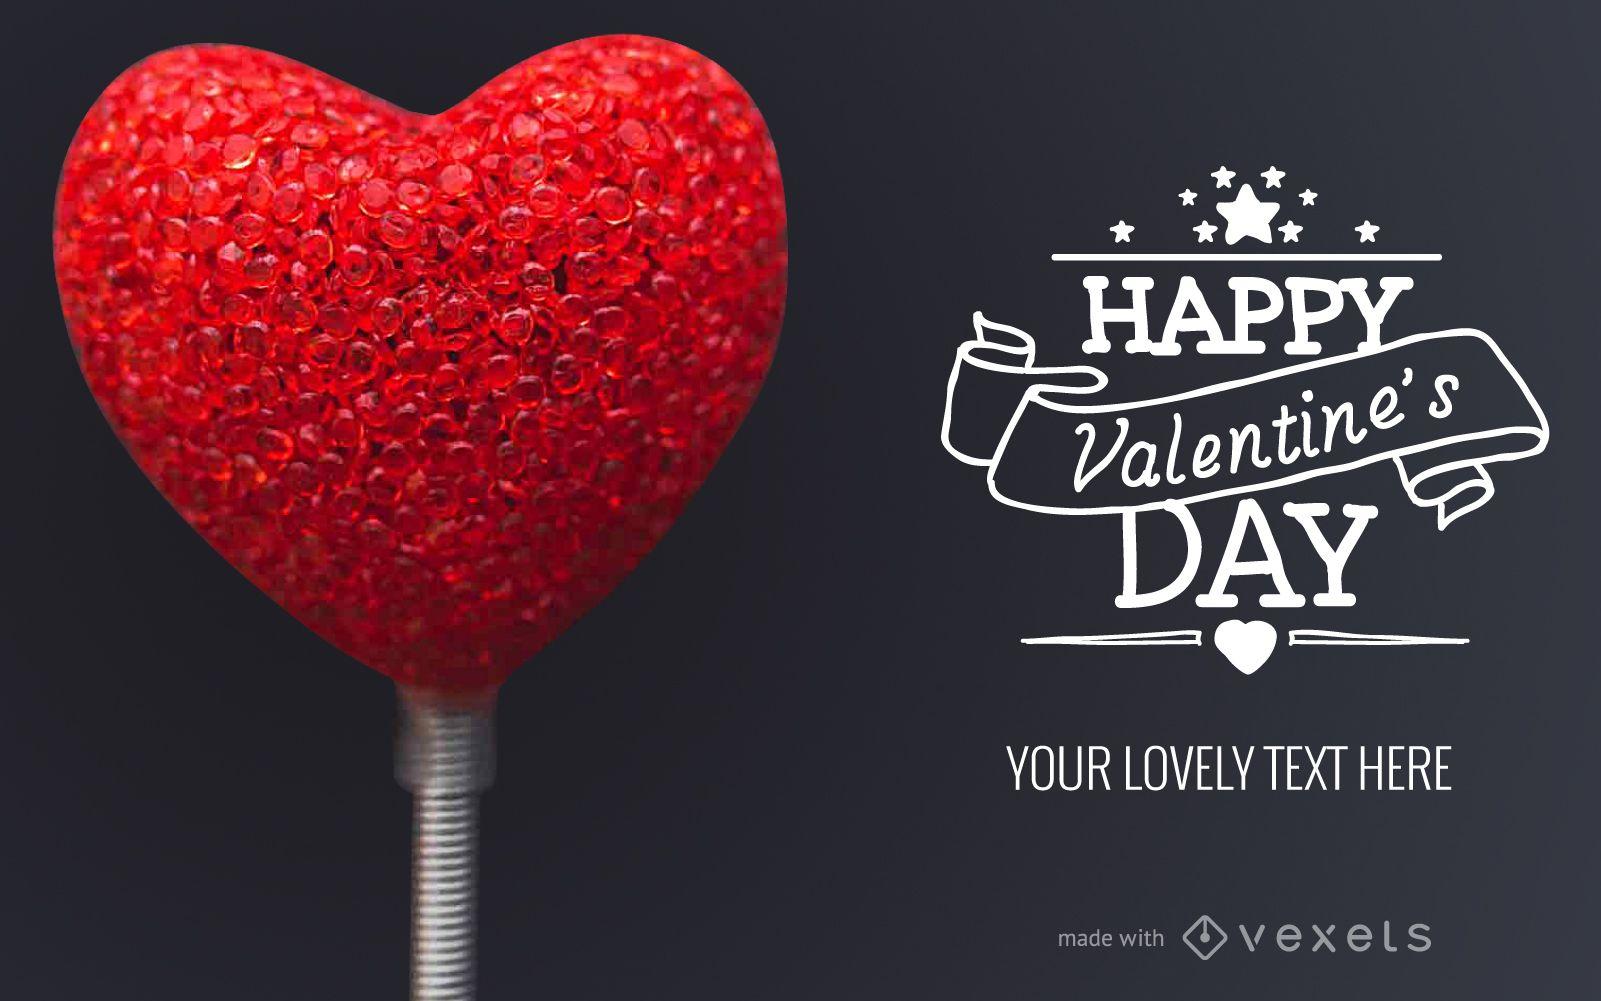 Valentine's Day card design maker